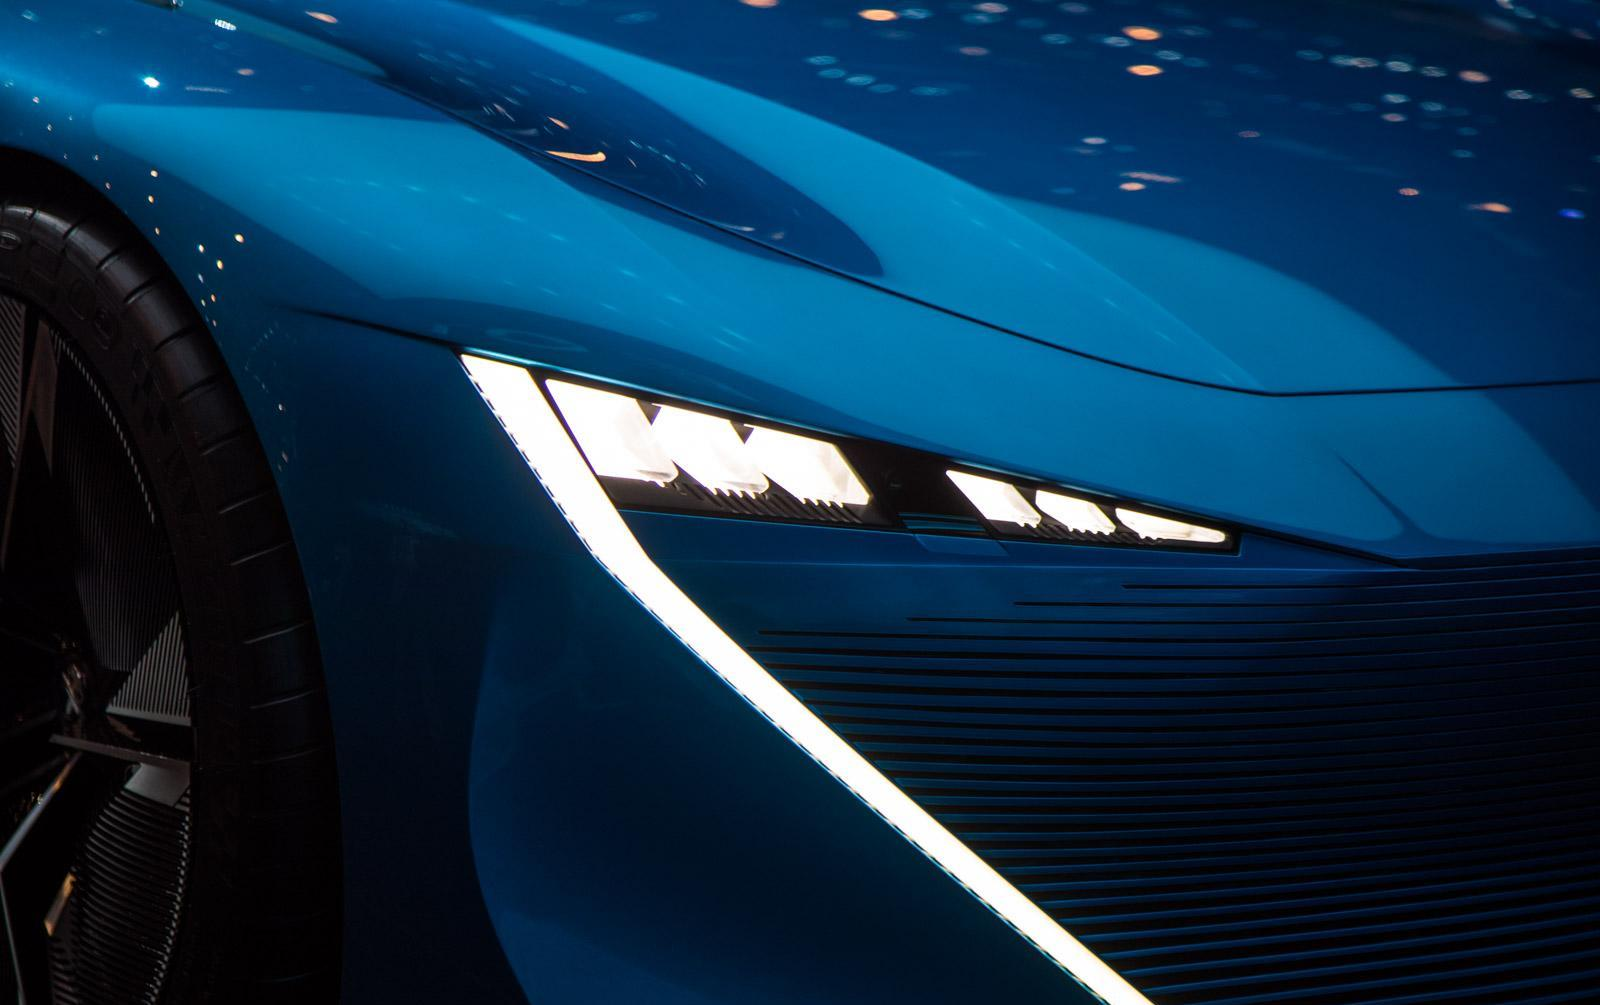 Peugeot-instinct-concept-004